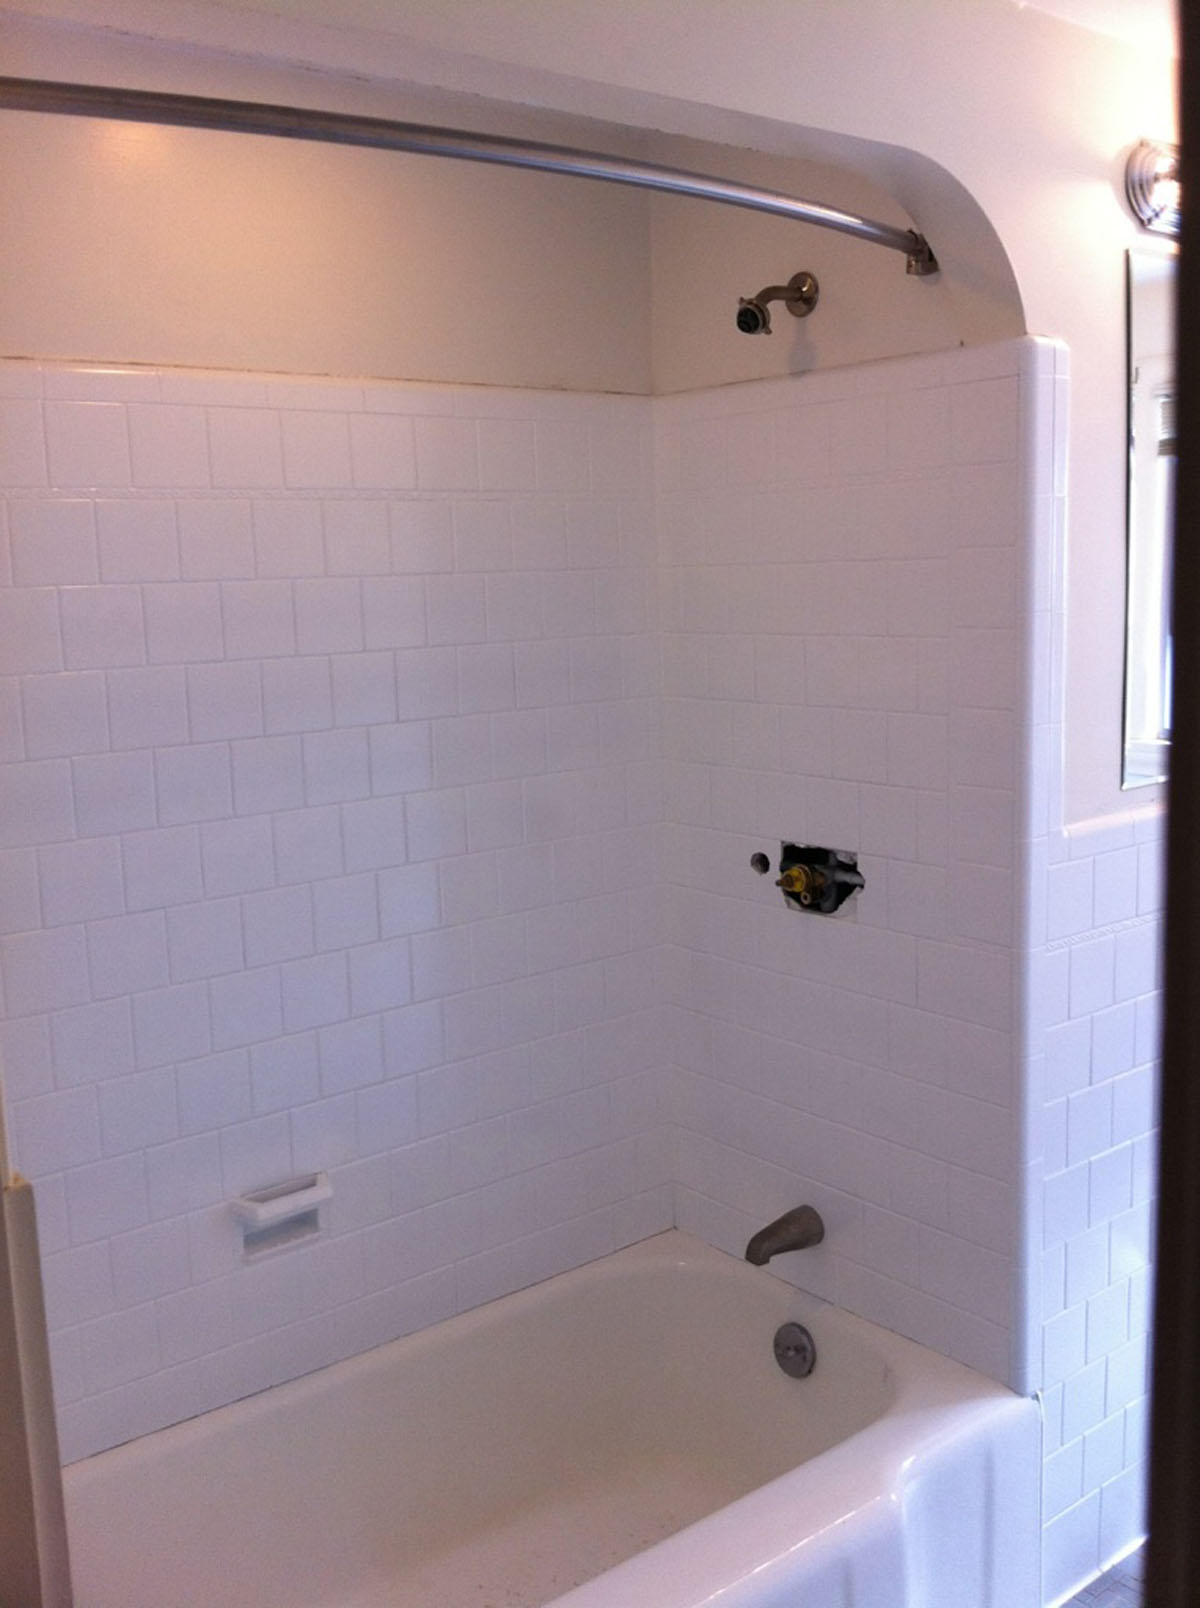 Tile surround after reglazing